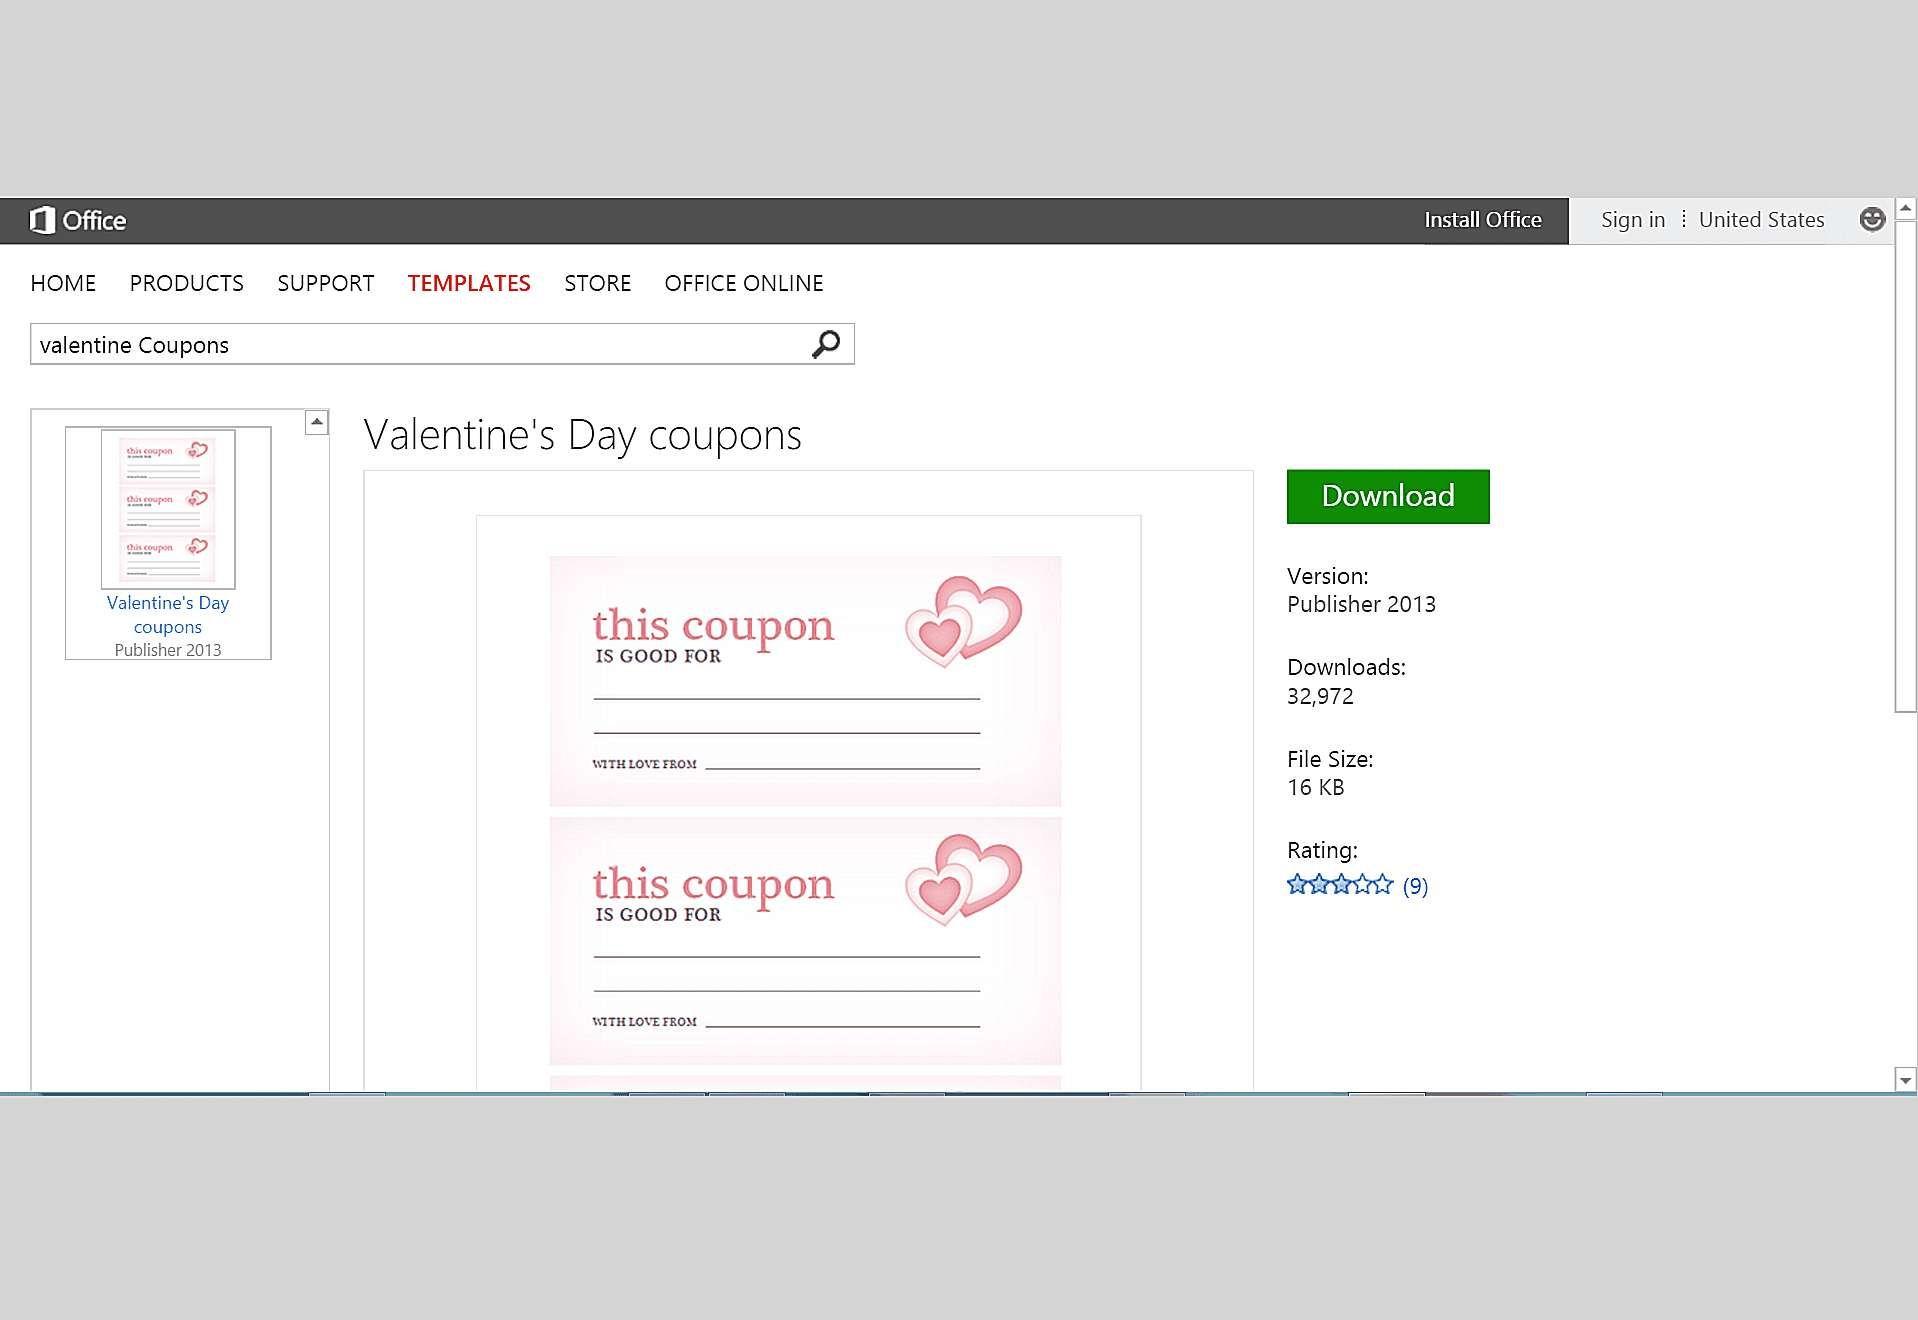 Open Office Business Card Template Inspirational Free For Openoffice Business Car Valentine Card Template Gift Certificate Template Word Valentines Card Design